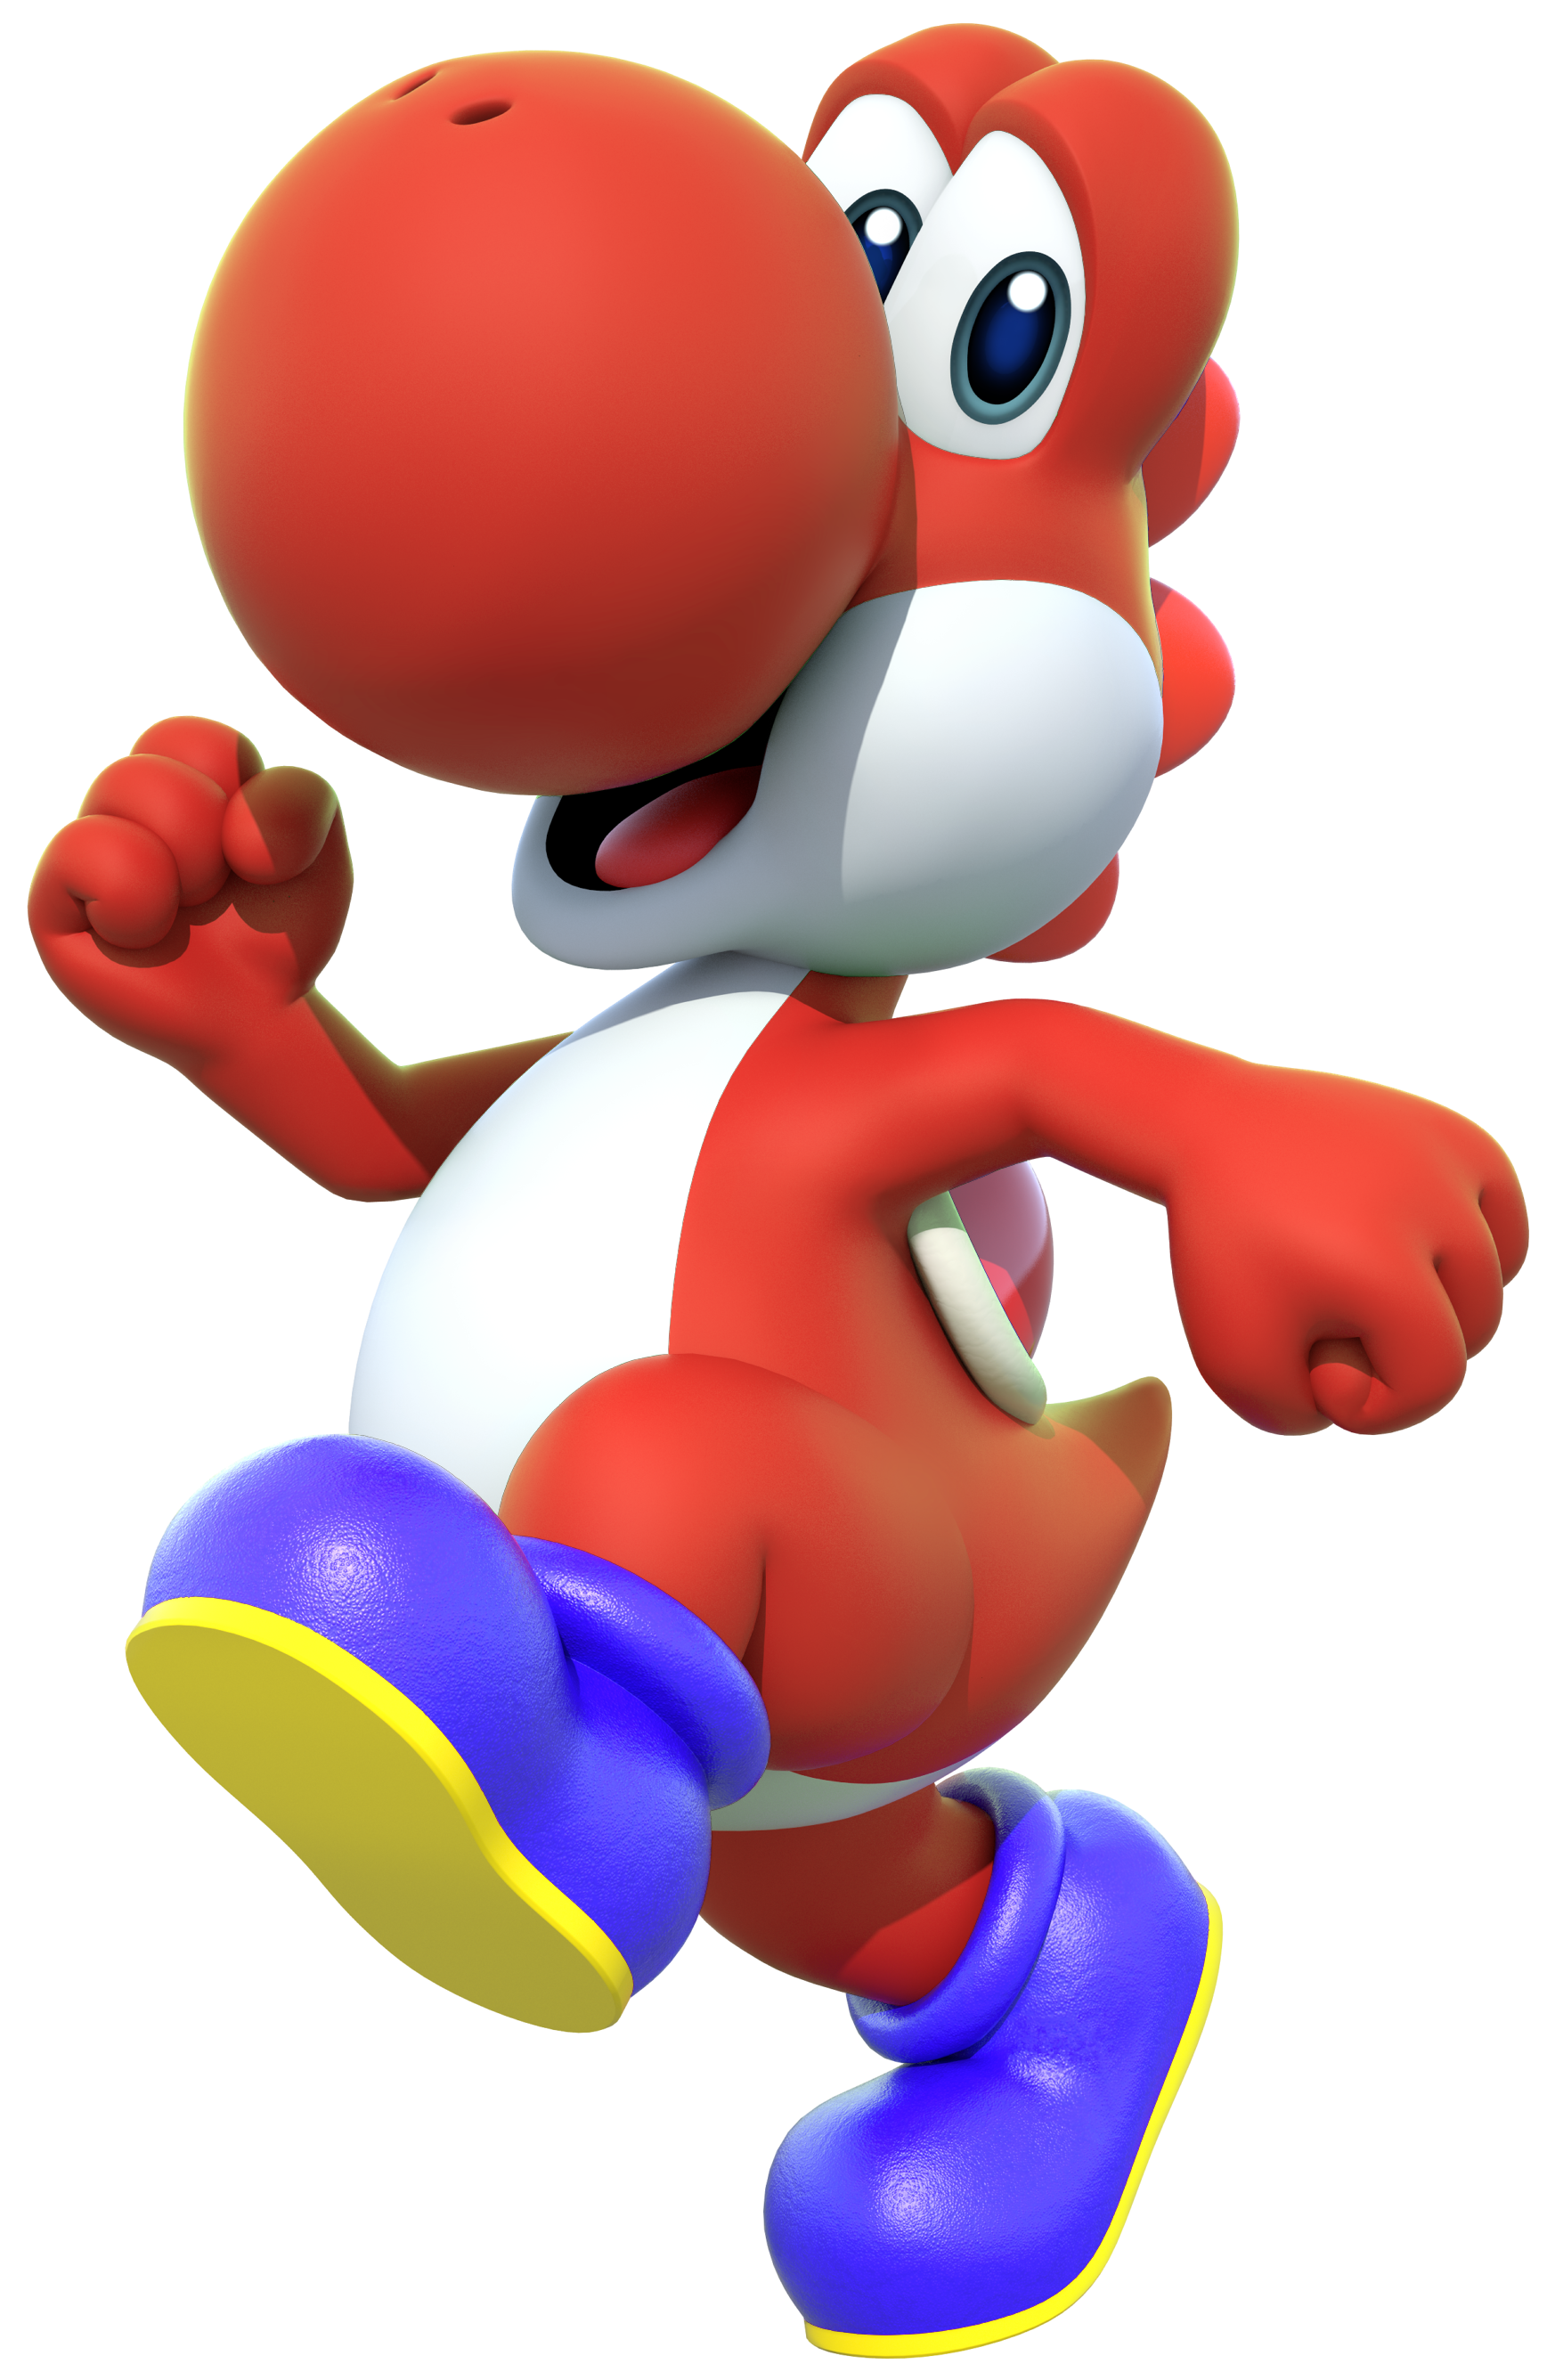 Roter Yoshi Mariowiki Fandom Powered By Wikia